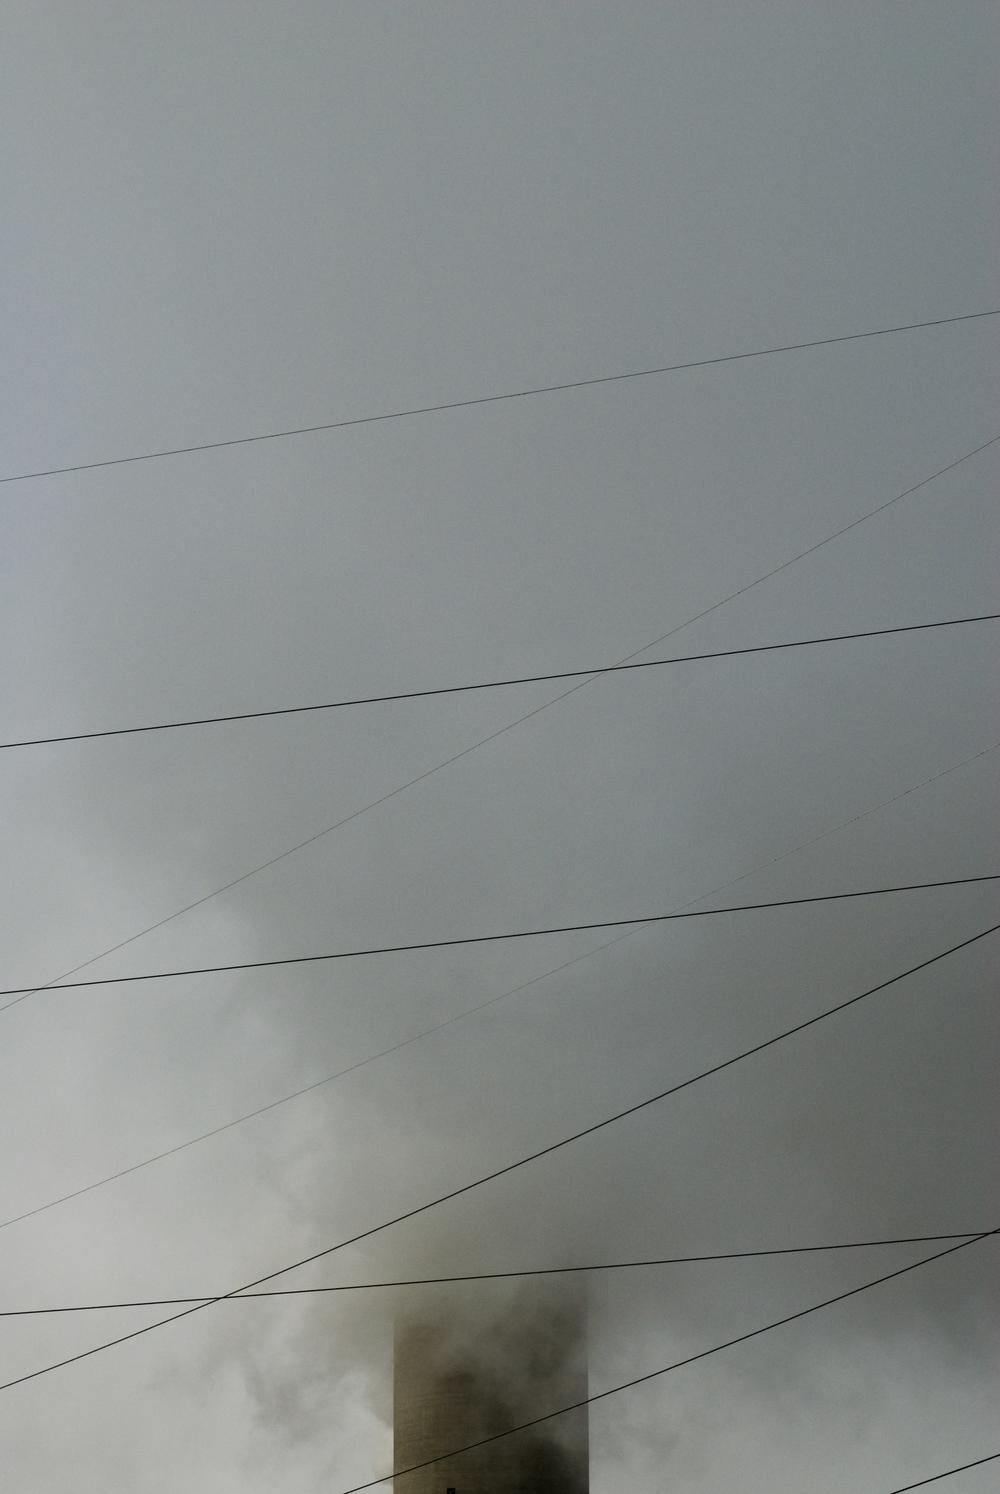 kenosha_fog.jpg